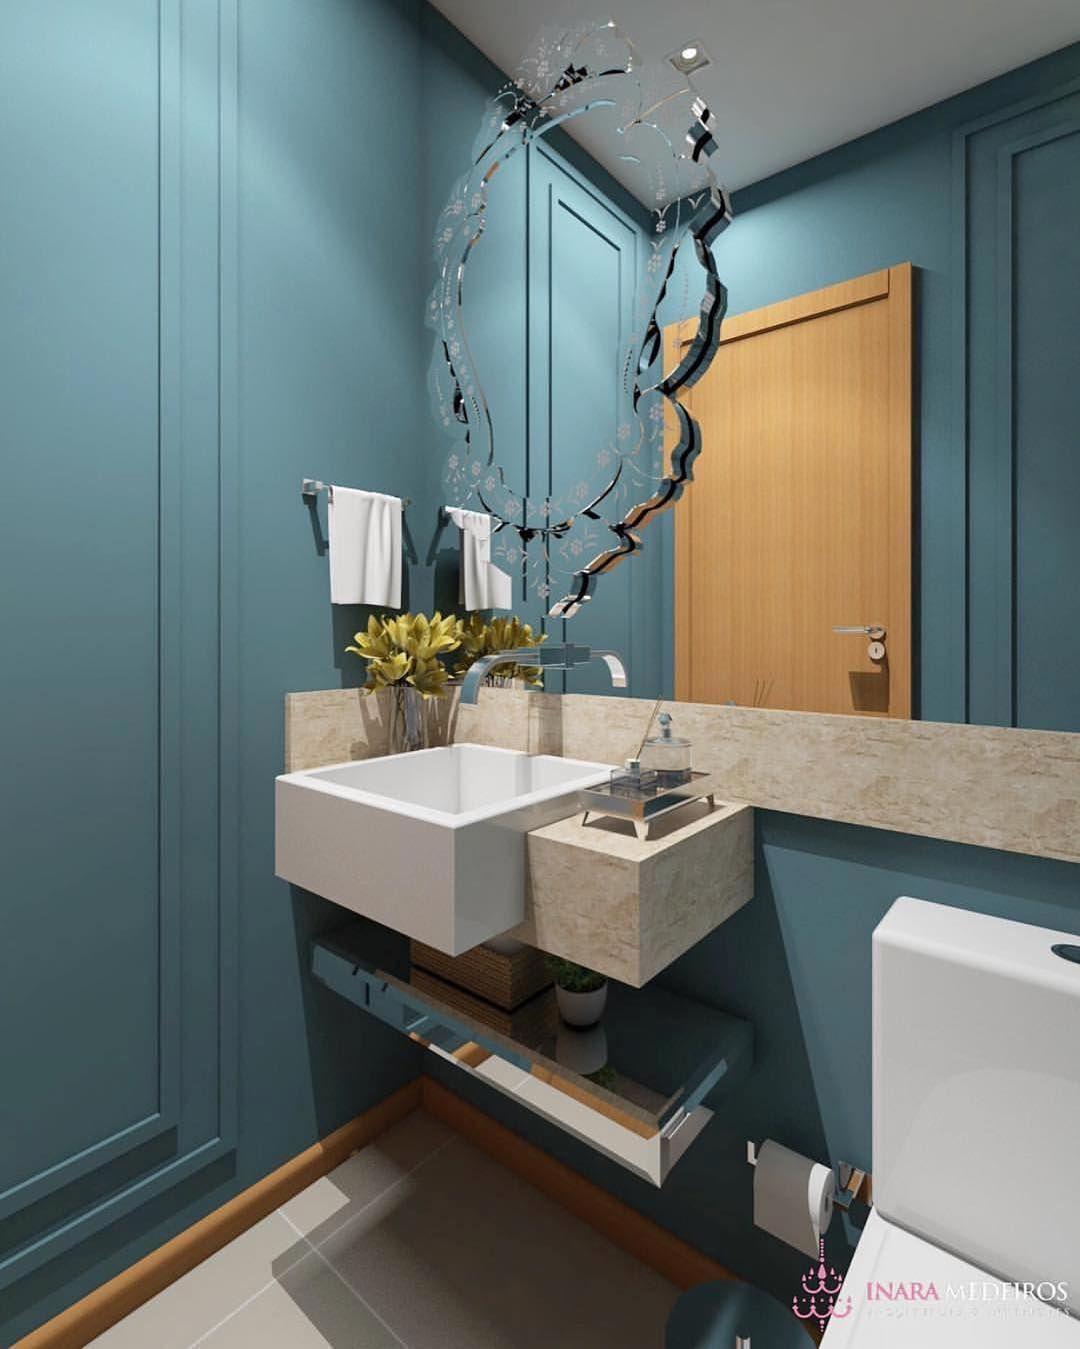 غريب شكل المرايا وجمميلة Home Fashion Nice مرايا حمام نايس Home Decor Vanity Bathroom Vanity